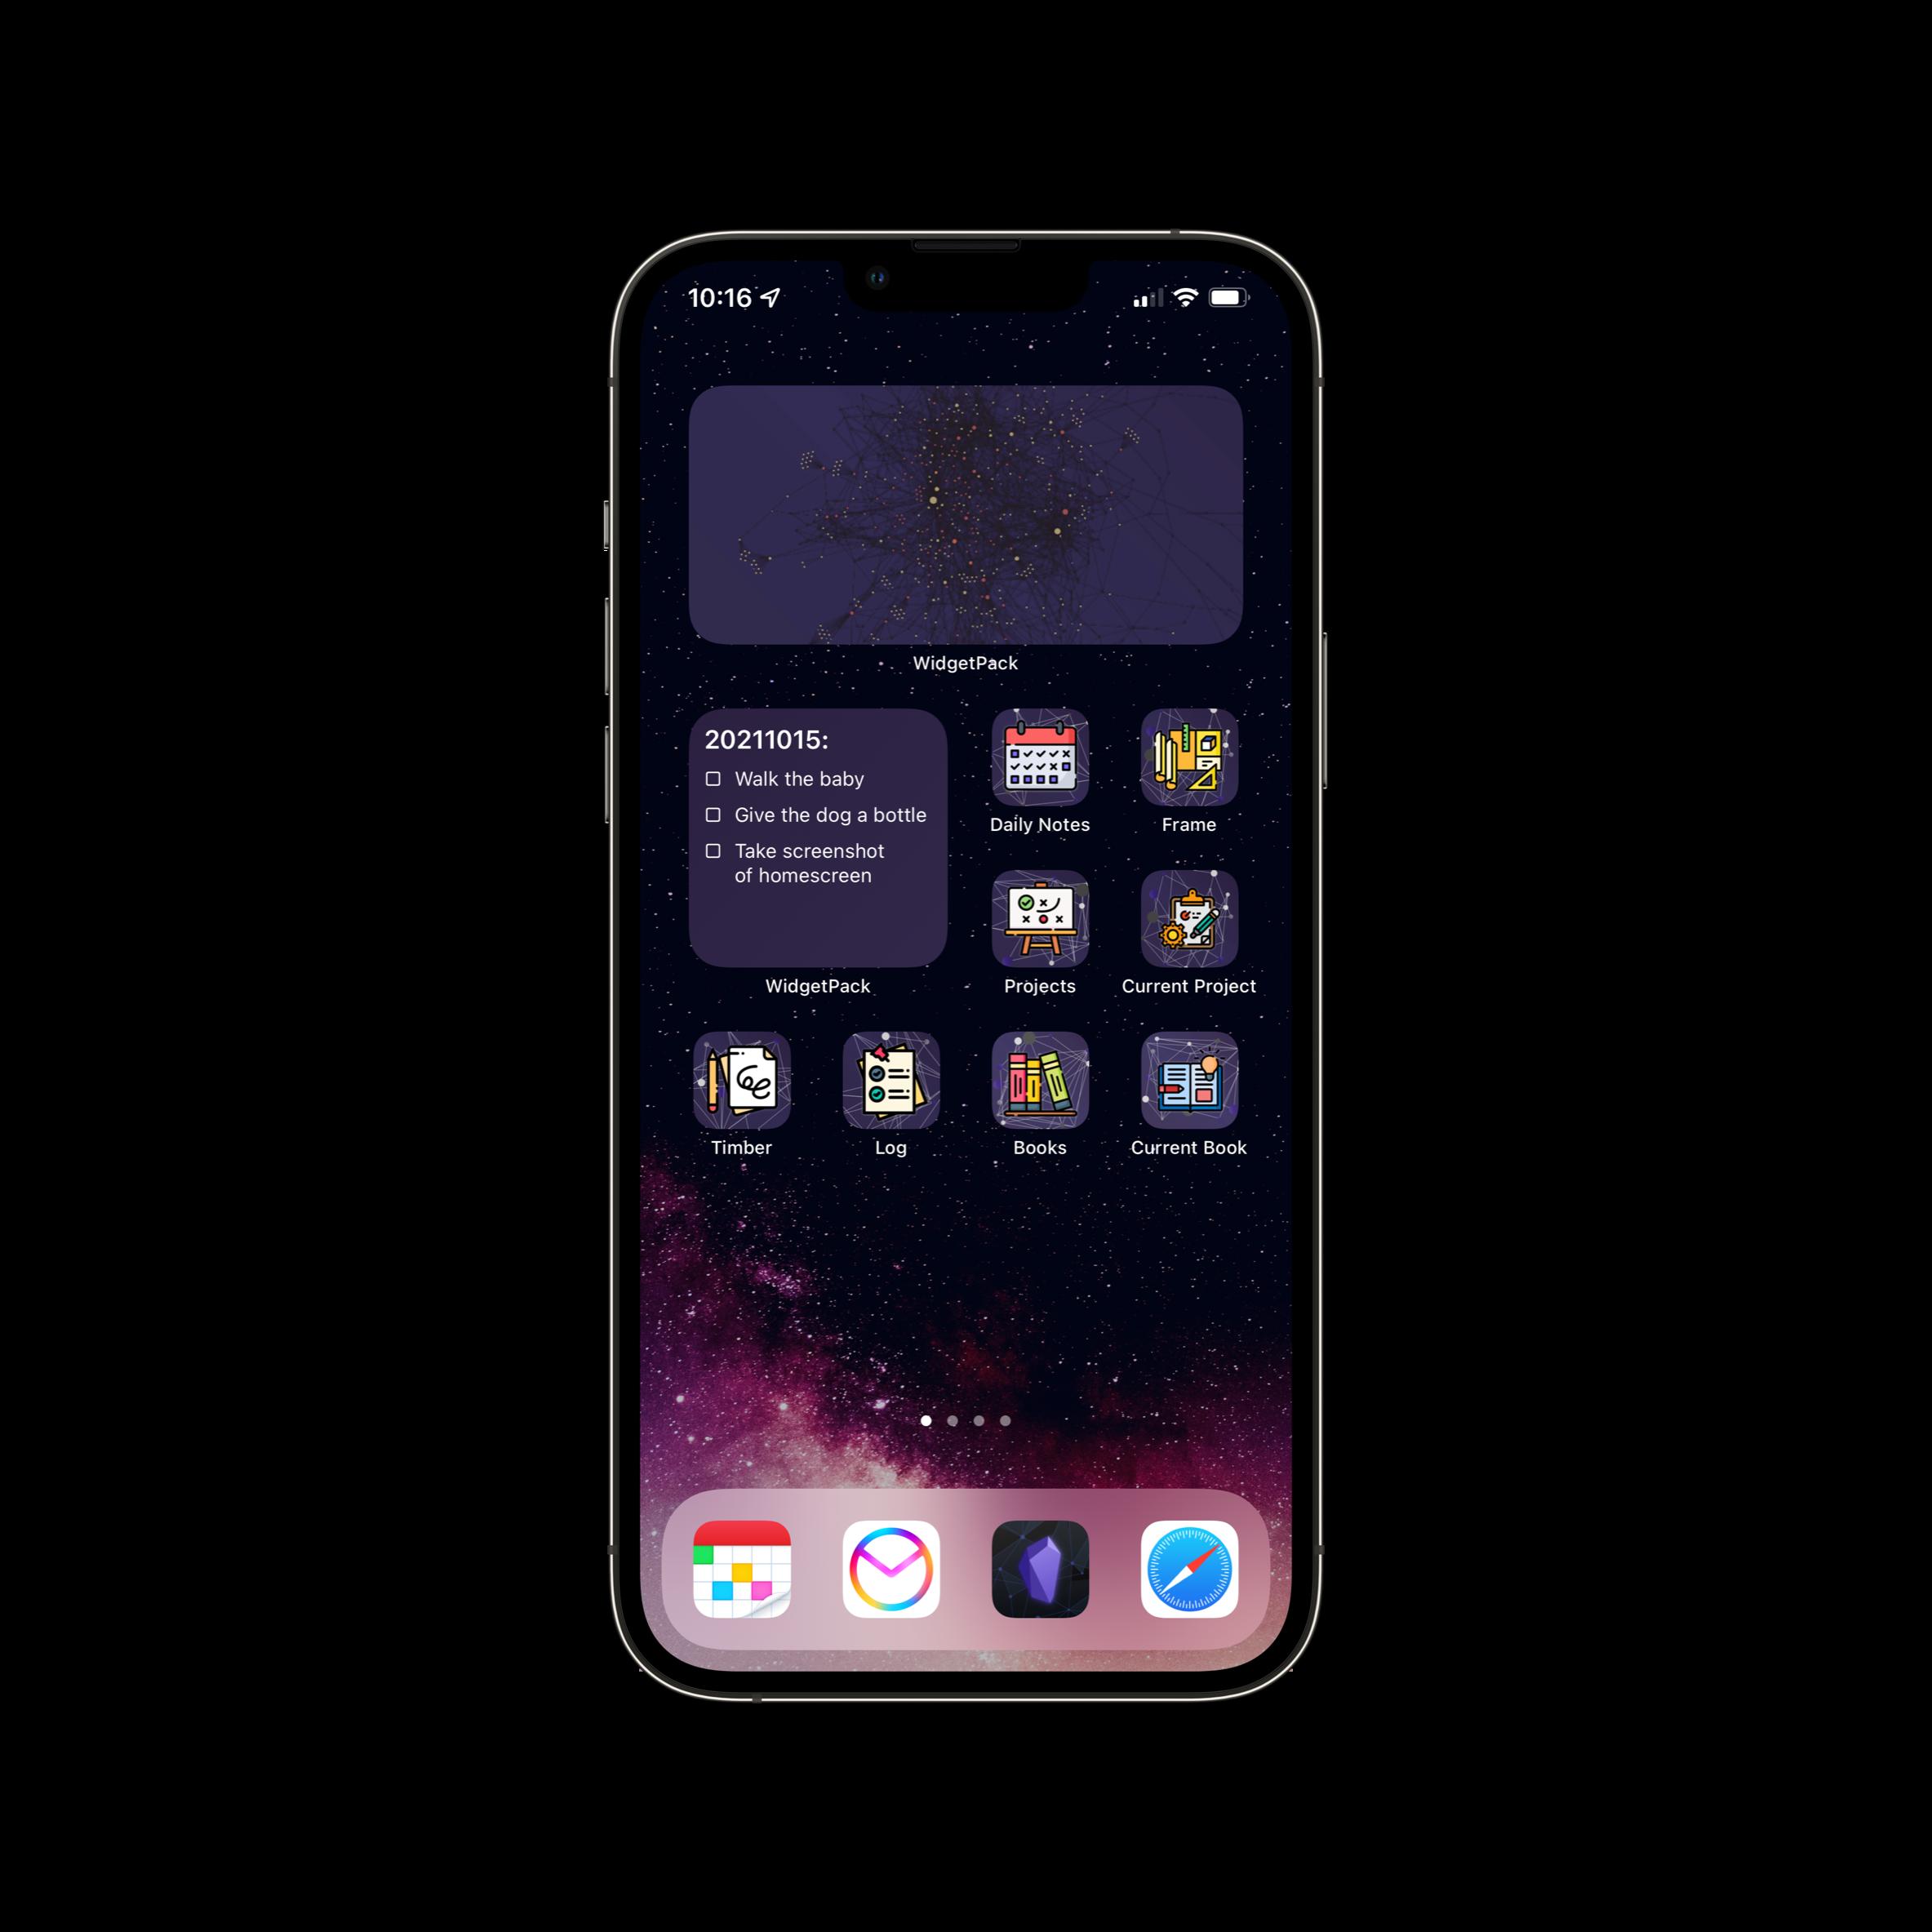 A screenshot of the homescreen.